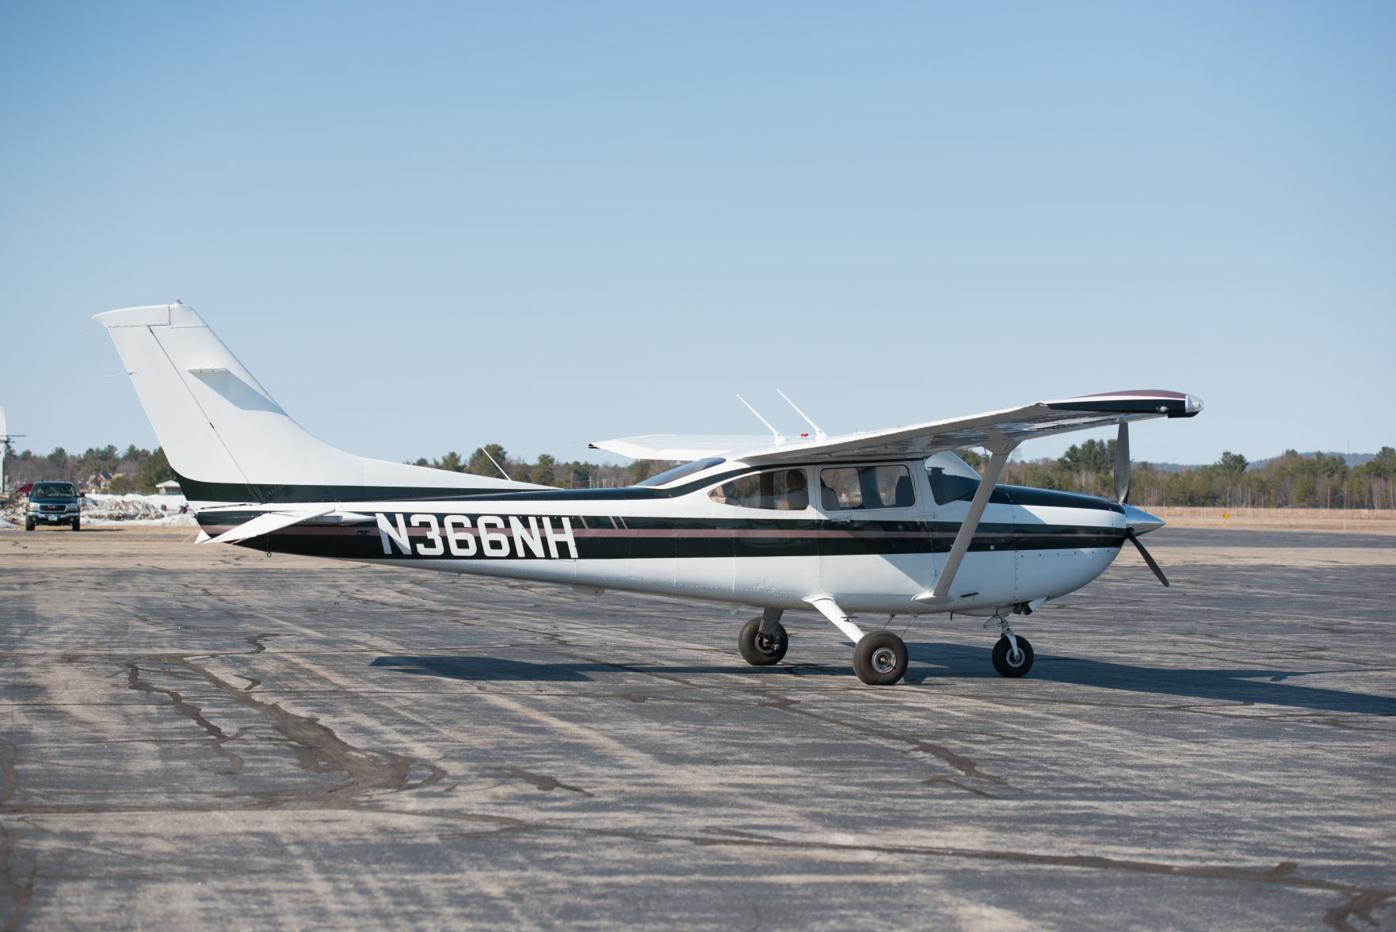 A plane to catch speeders